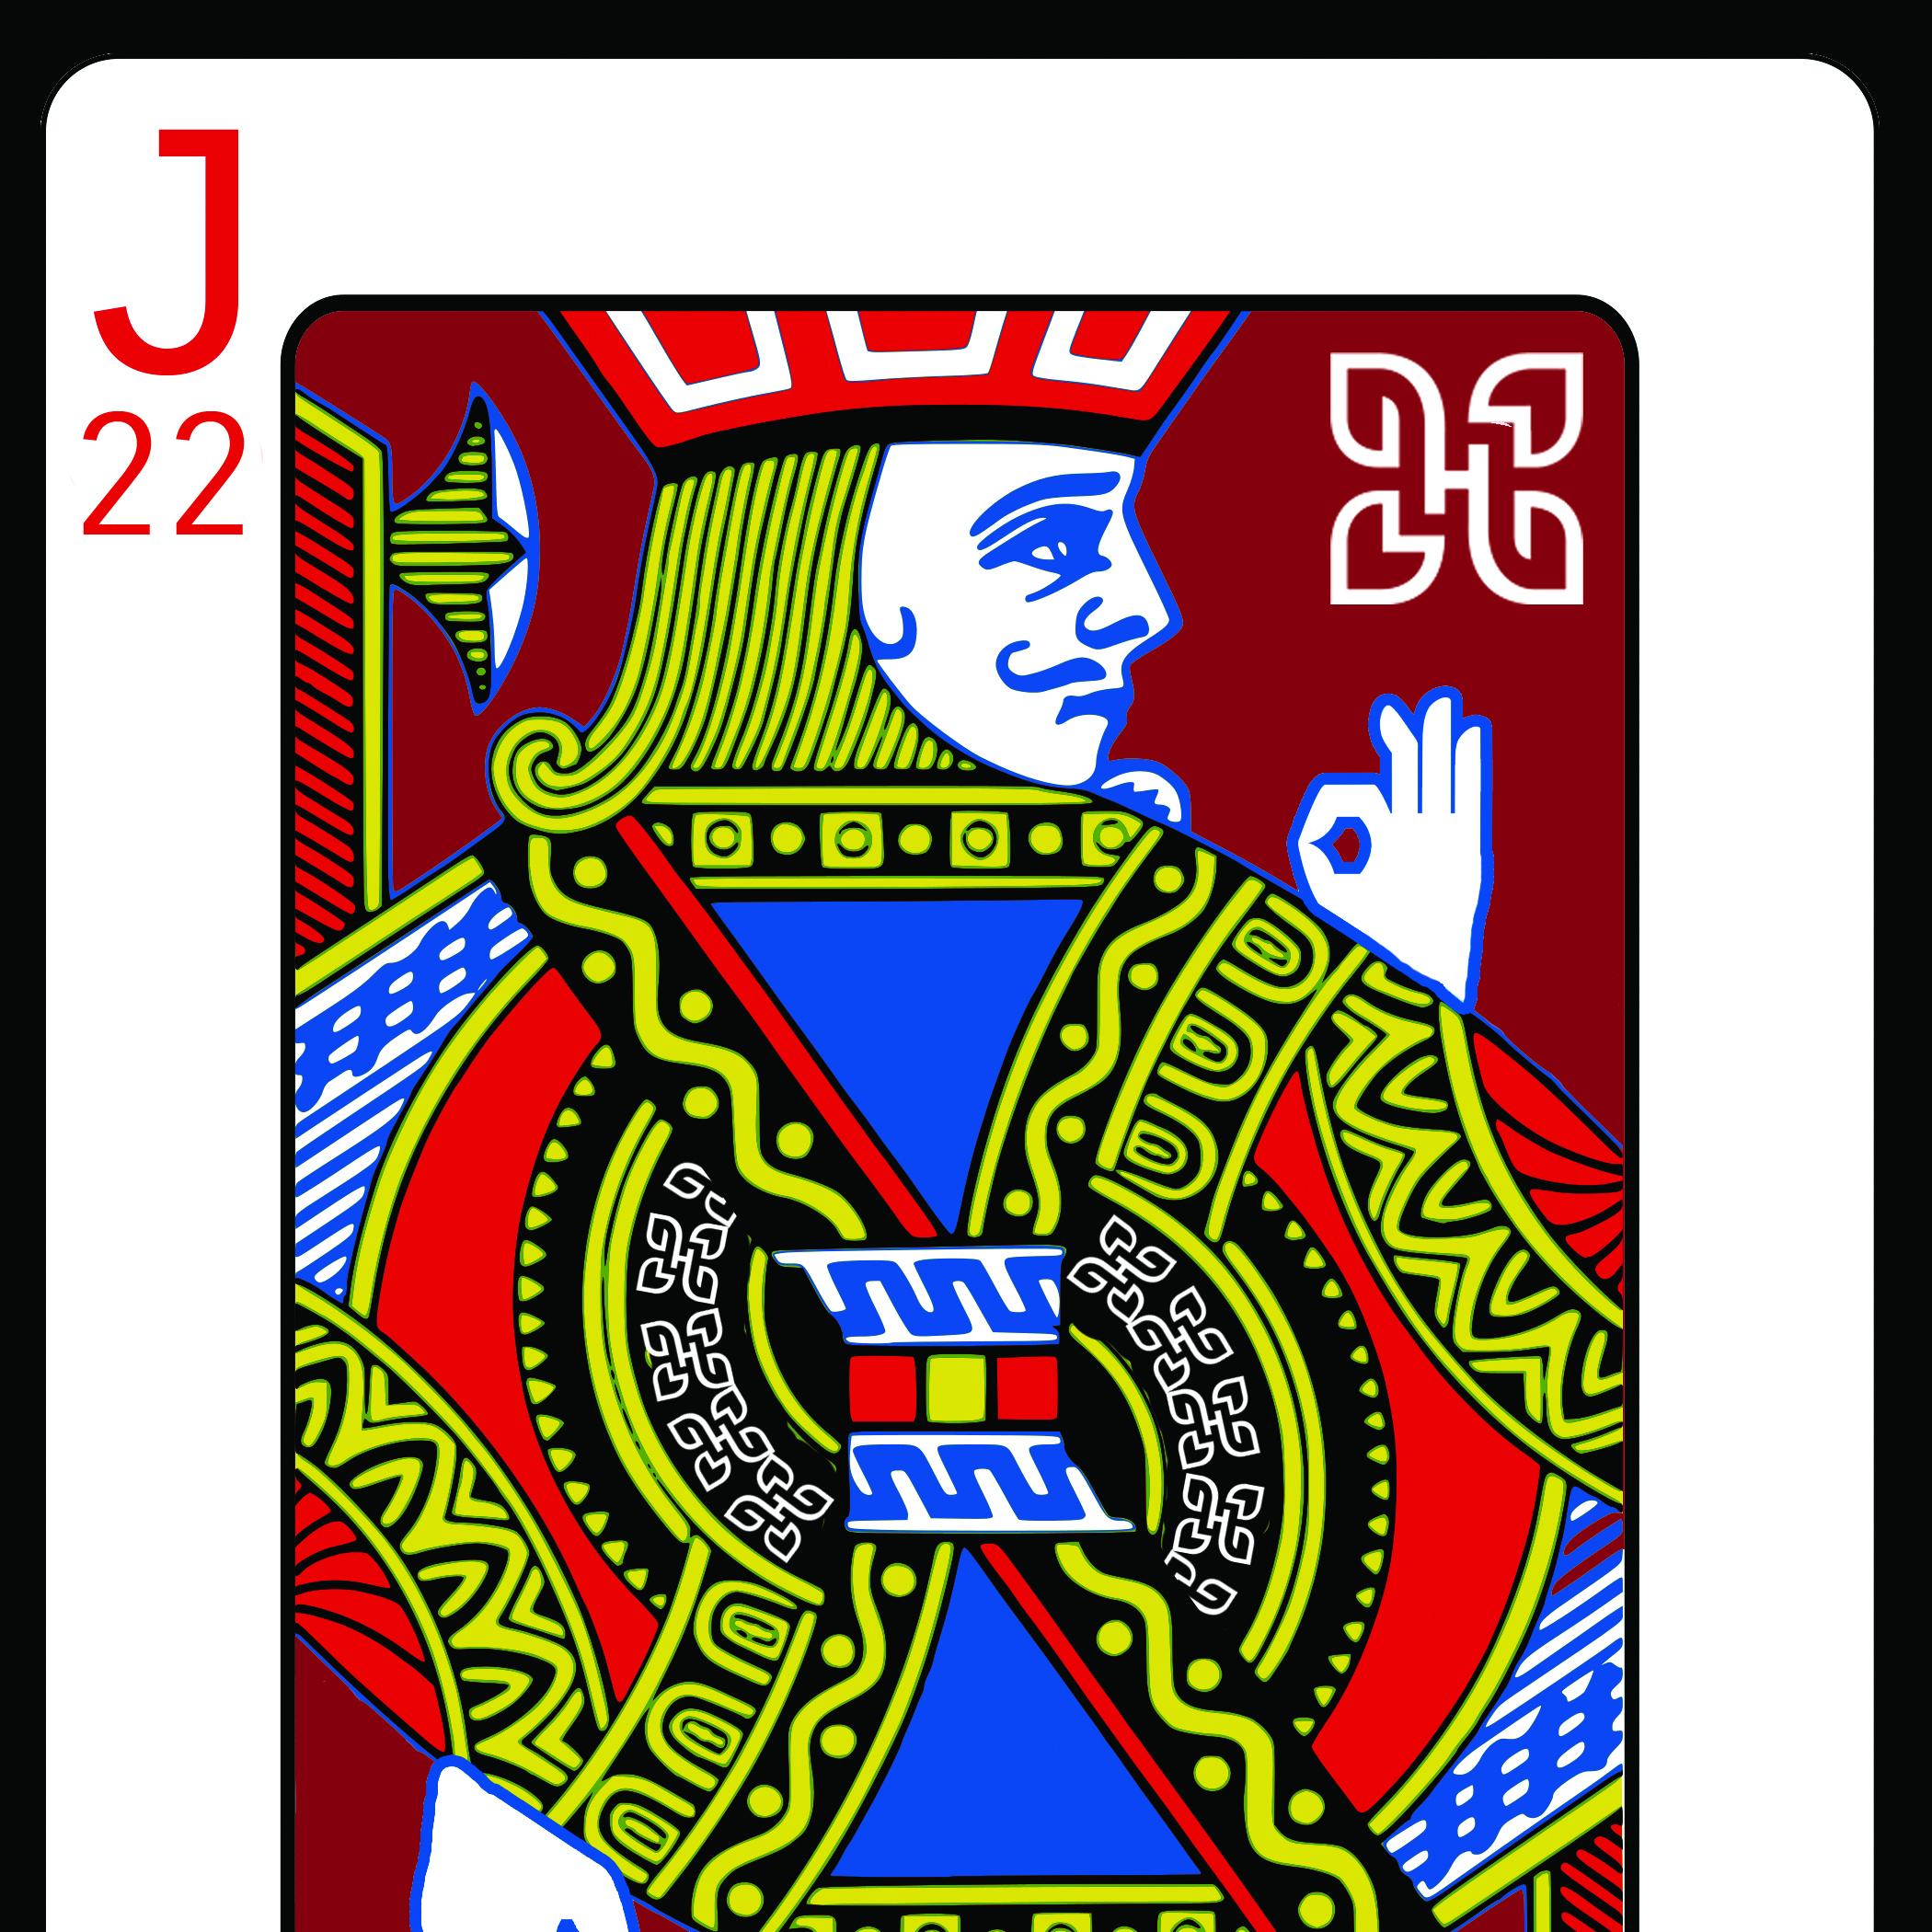 22Jack